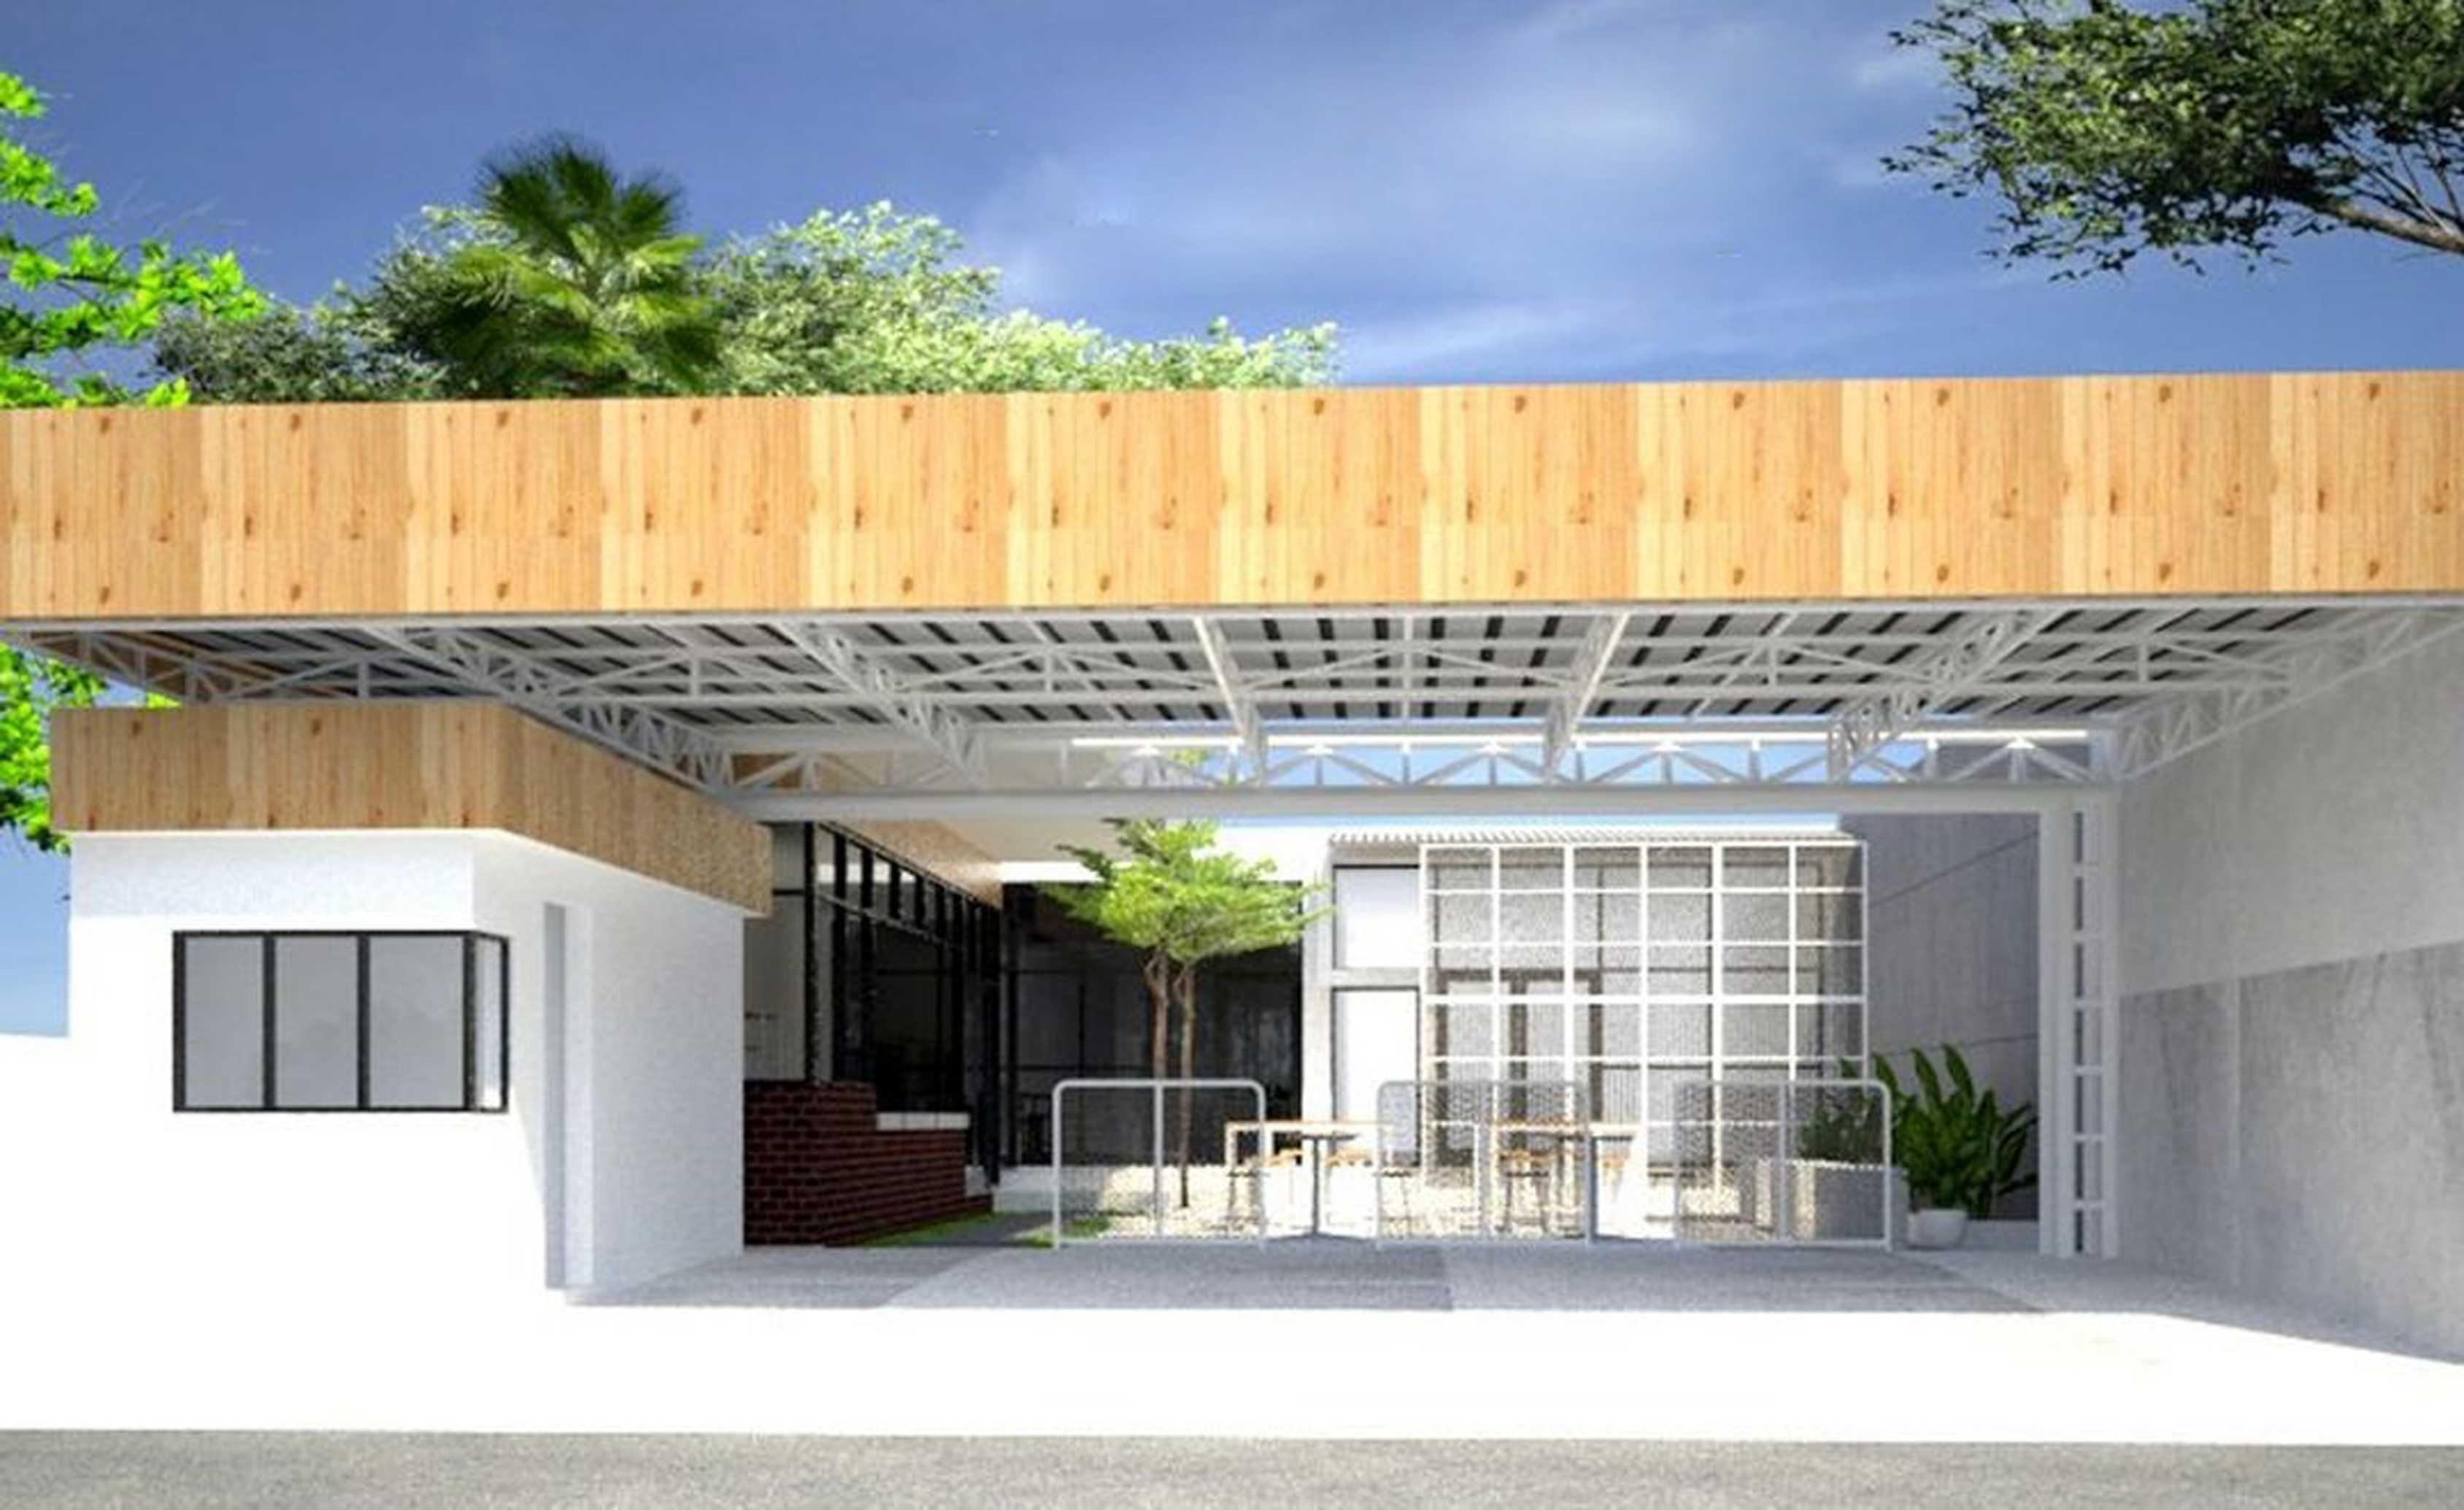 Dirgamaya Studio Desain Cafe Konco Space Surakarta, Kota Surakarta, Jawa Tengah, Indonesia Surakarta, Kota Surakarta, Jawa Tengah, Indonesia Dirgamaya-Studio-Desain-Cafe-Konco-Space   114080